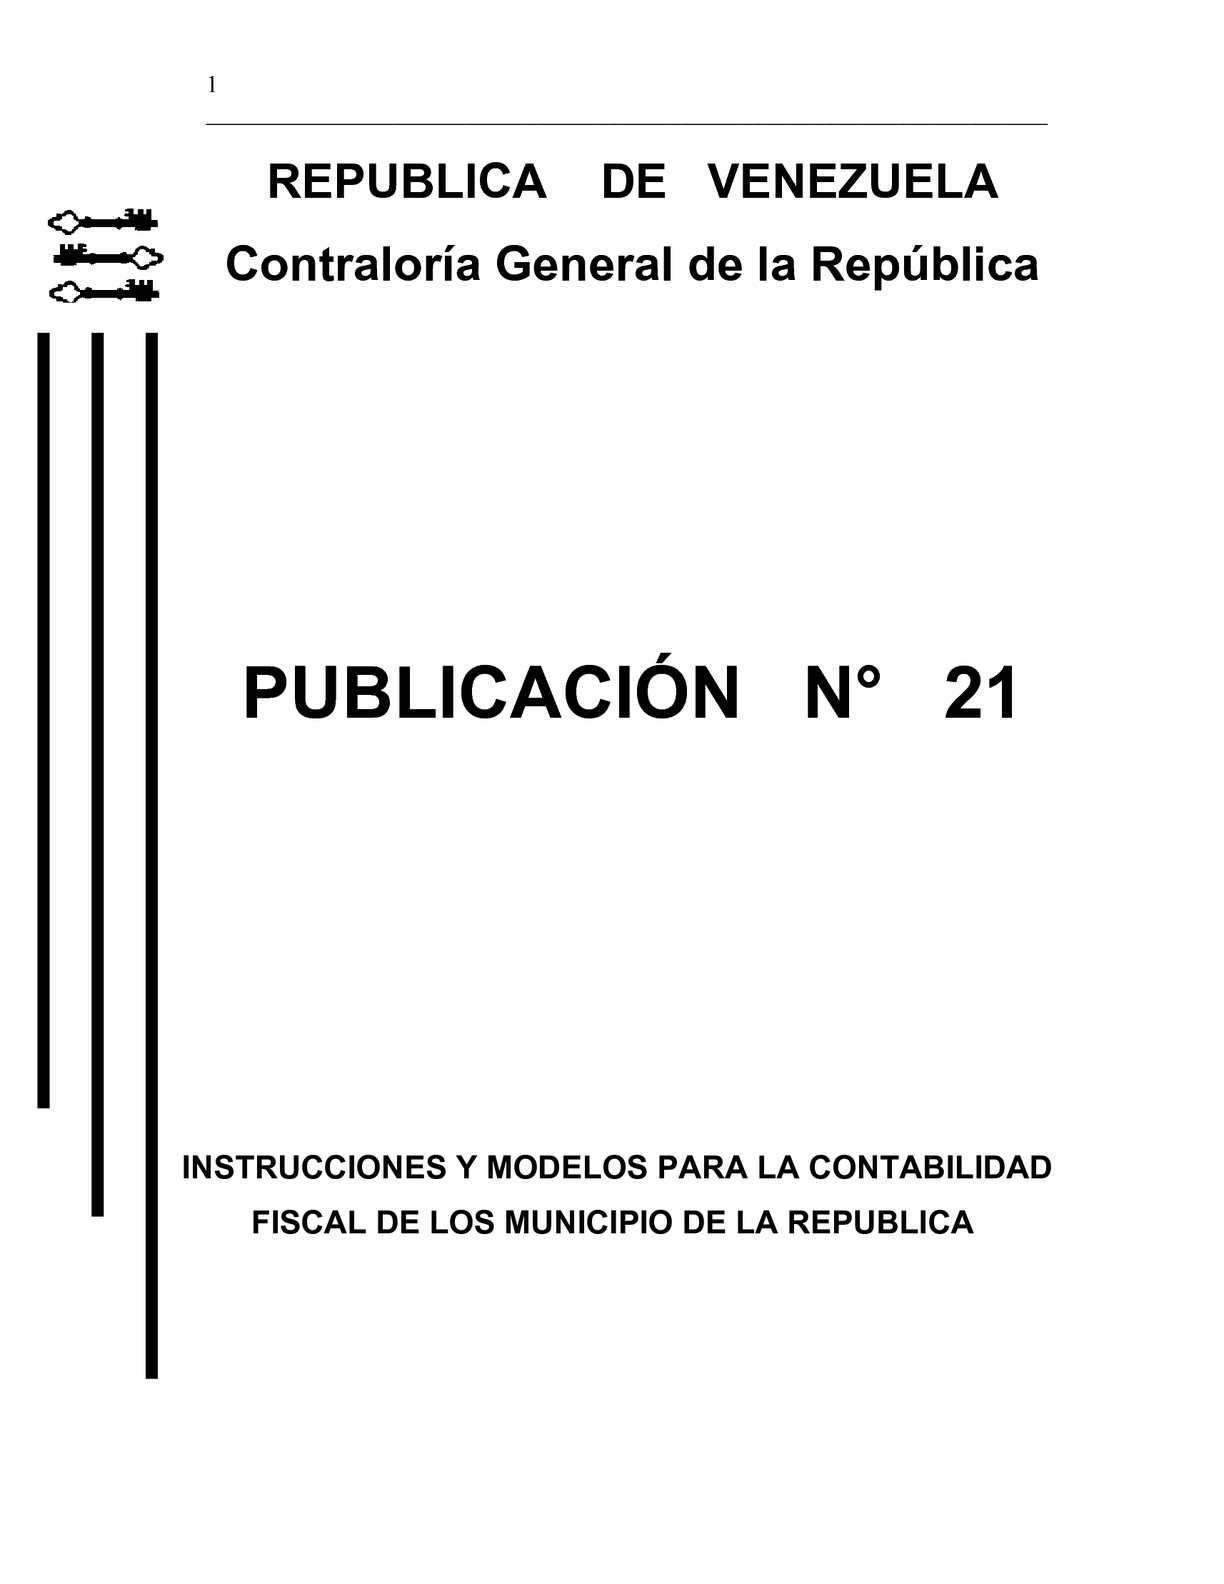 Calaméo - CGR Publicación 21